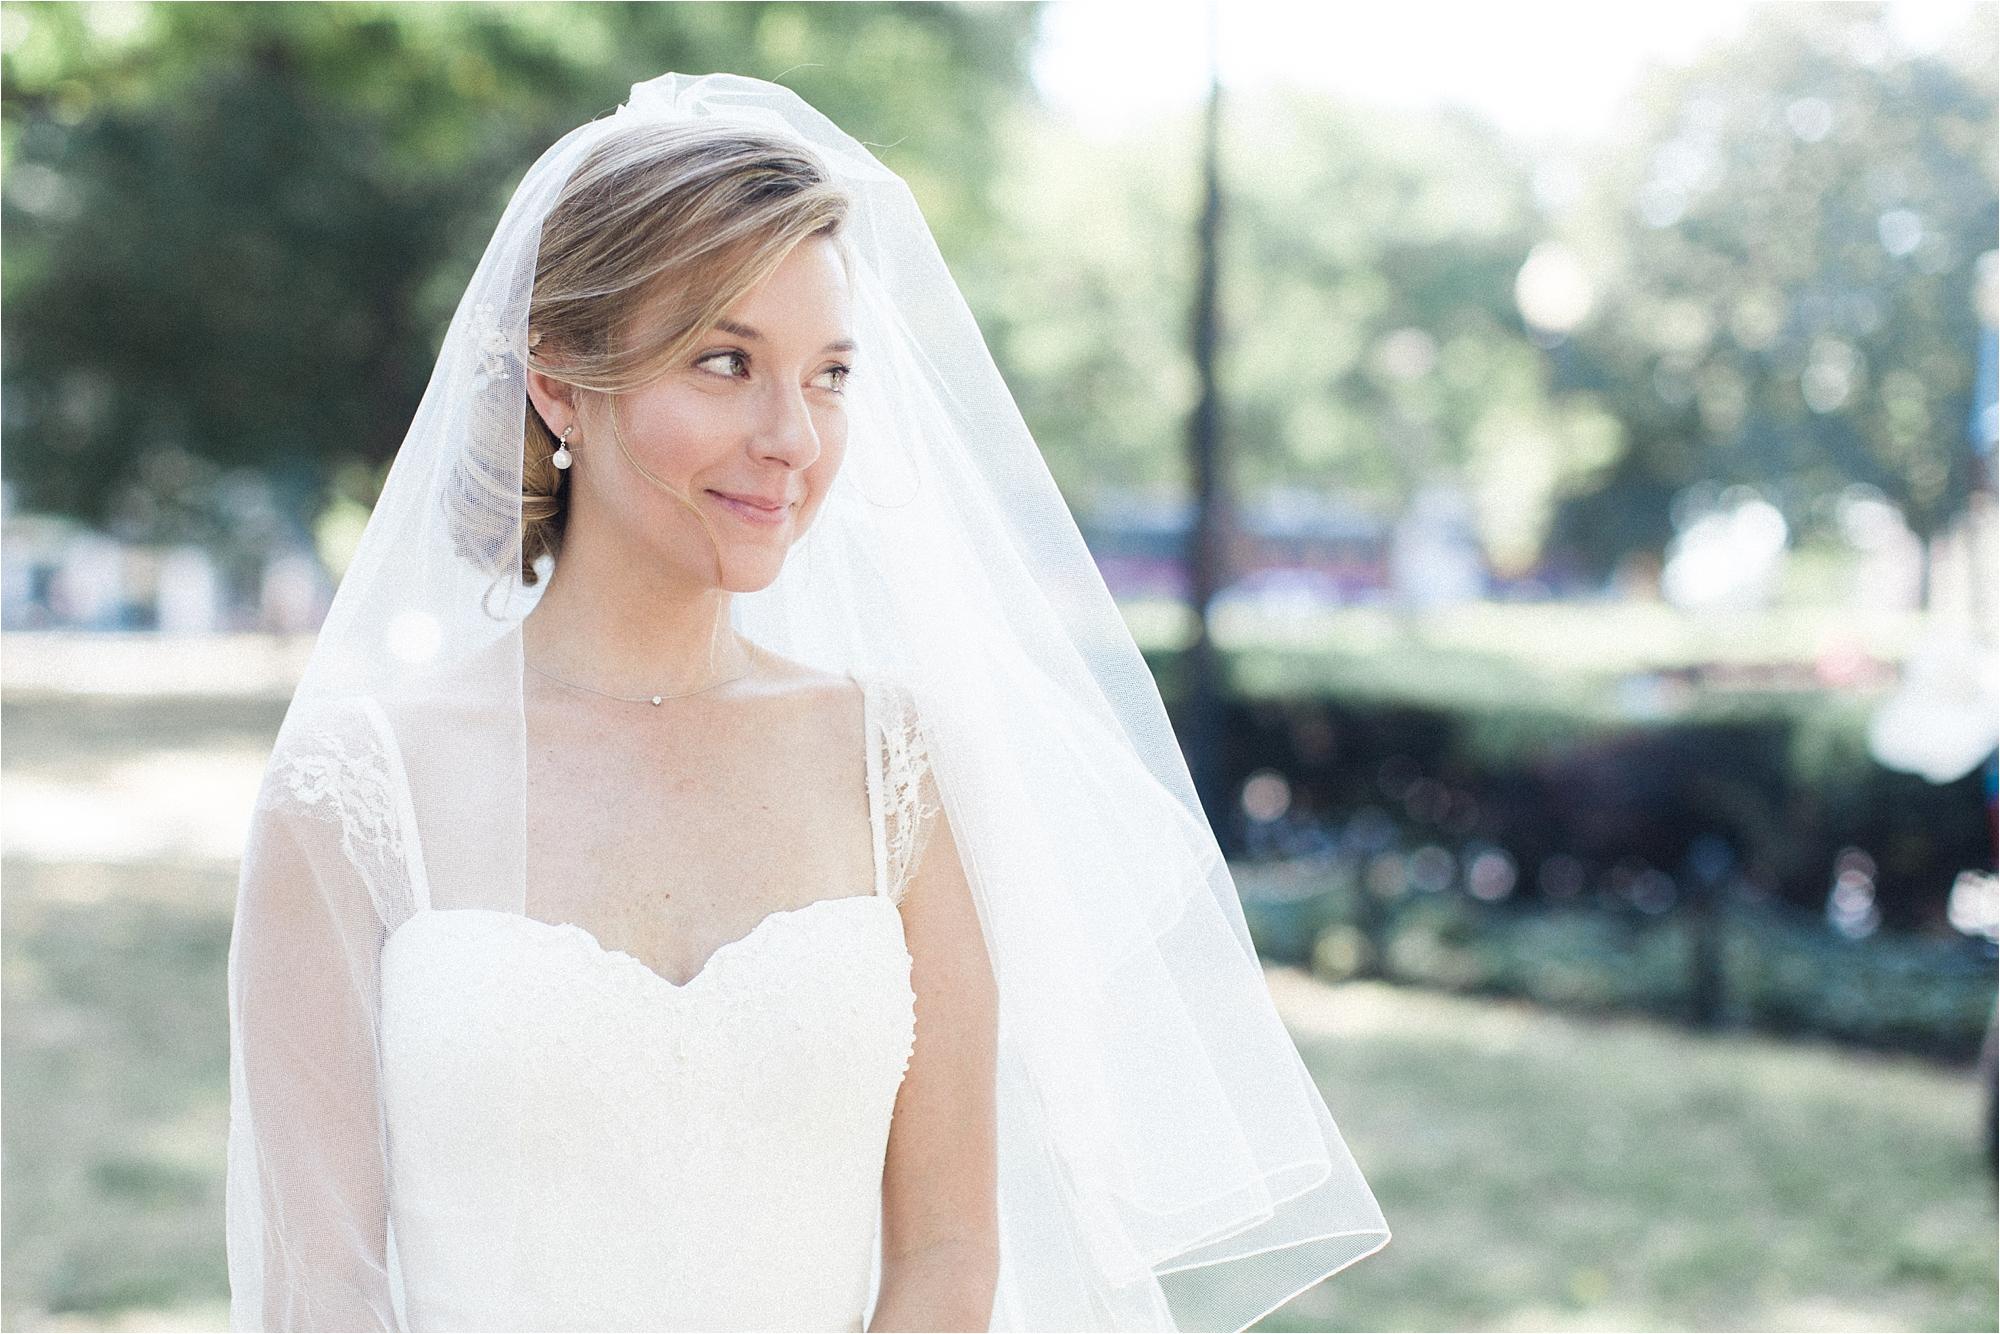 stephanie-yonce-photography-elegant-private-club-washington-dc-wedding-photos_0022.jpg